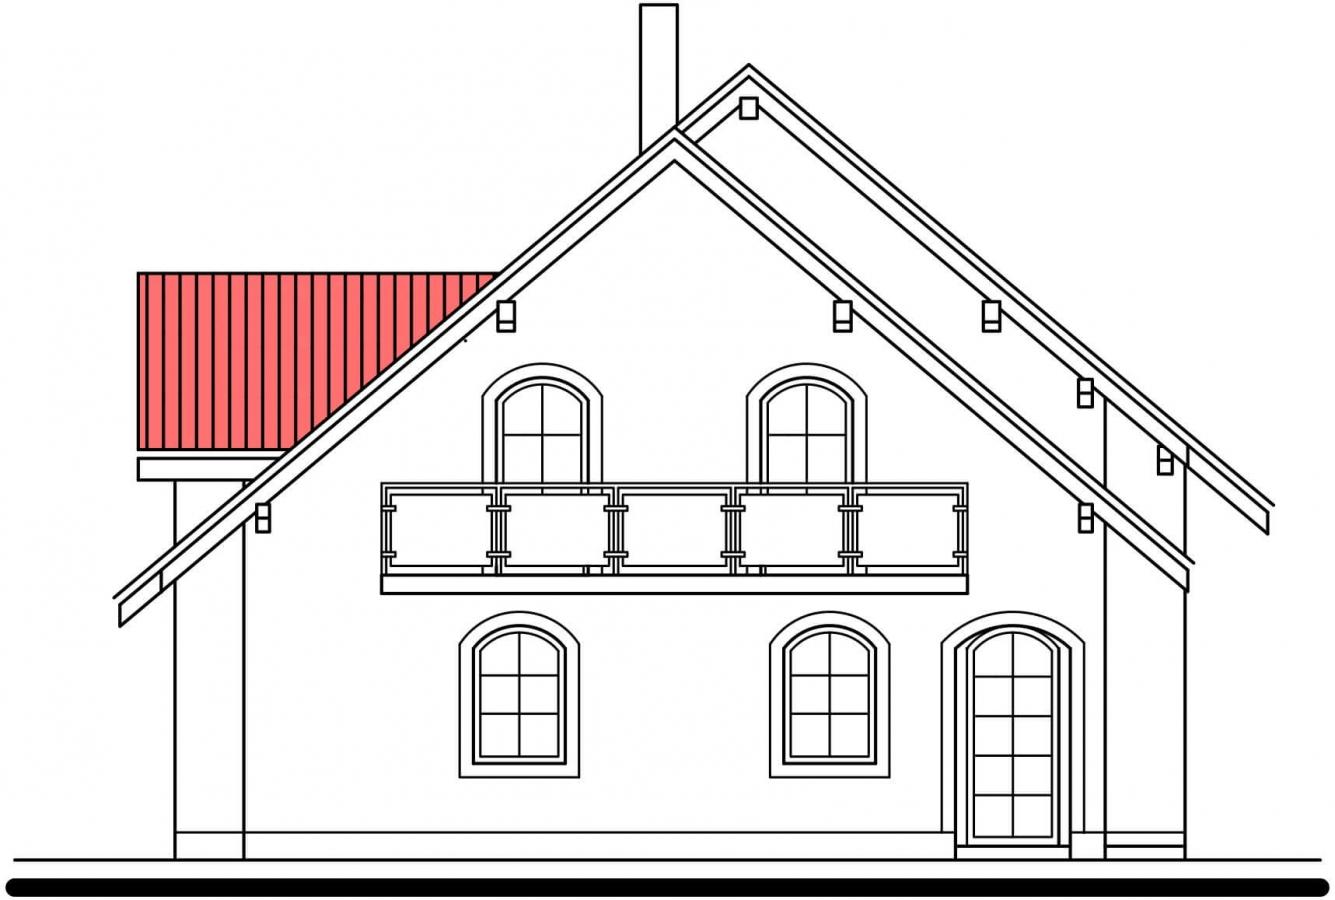 Pohľad 3. - Projekt 5-izbového domu s garážou.